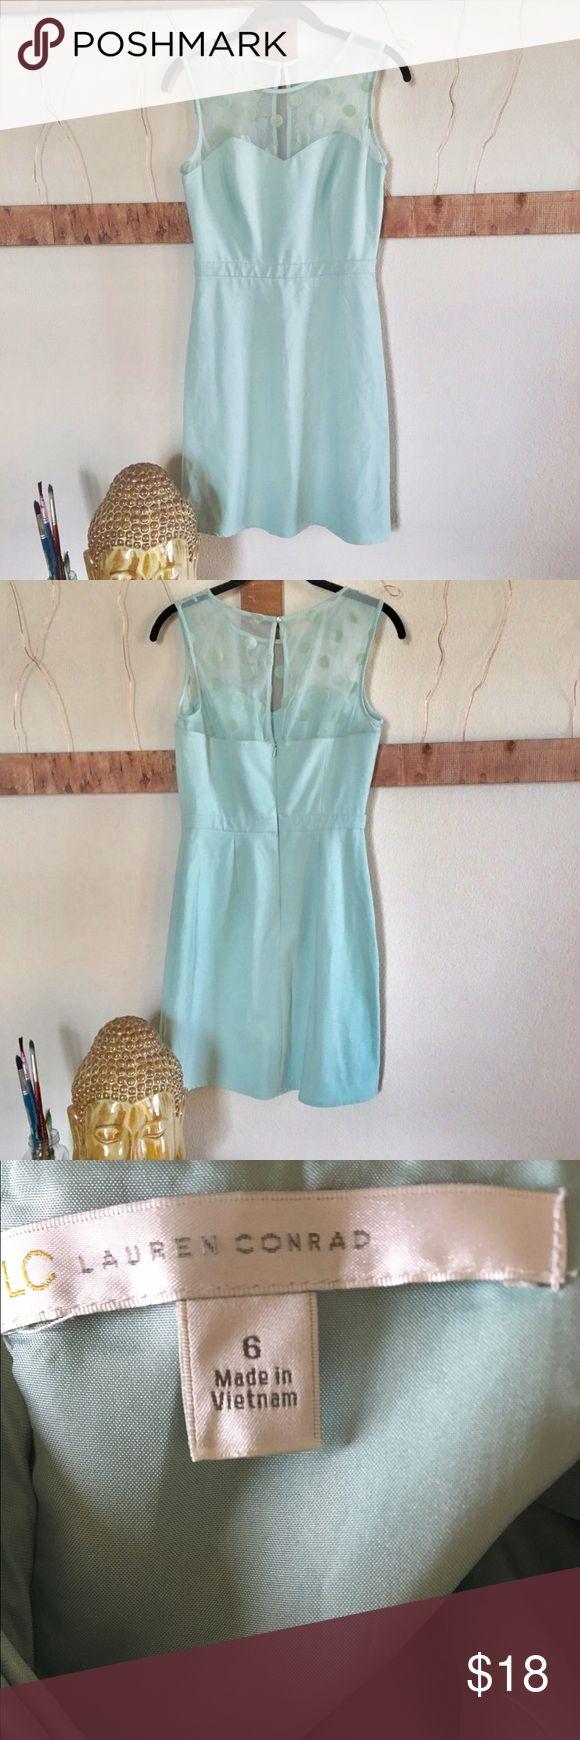 "LC mint Mini Dress Beautiful LC Conrad mint colored dress has Mech polkadot at the top🌻 size 6, 36"" length, 30"" bust✂️ LC Lauren Conrad Dresses Mini"